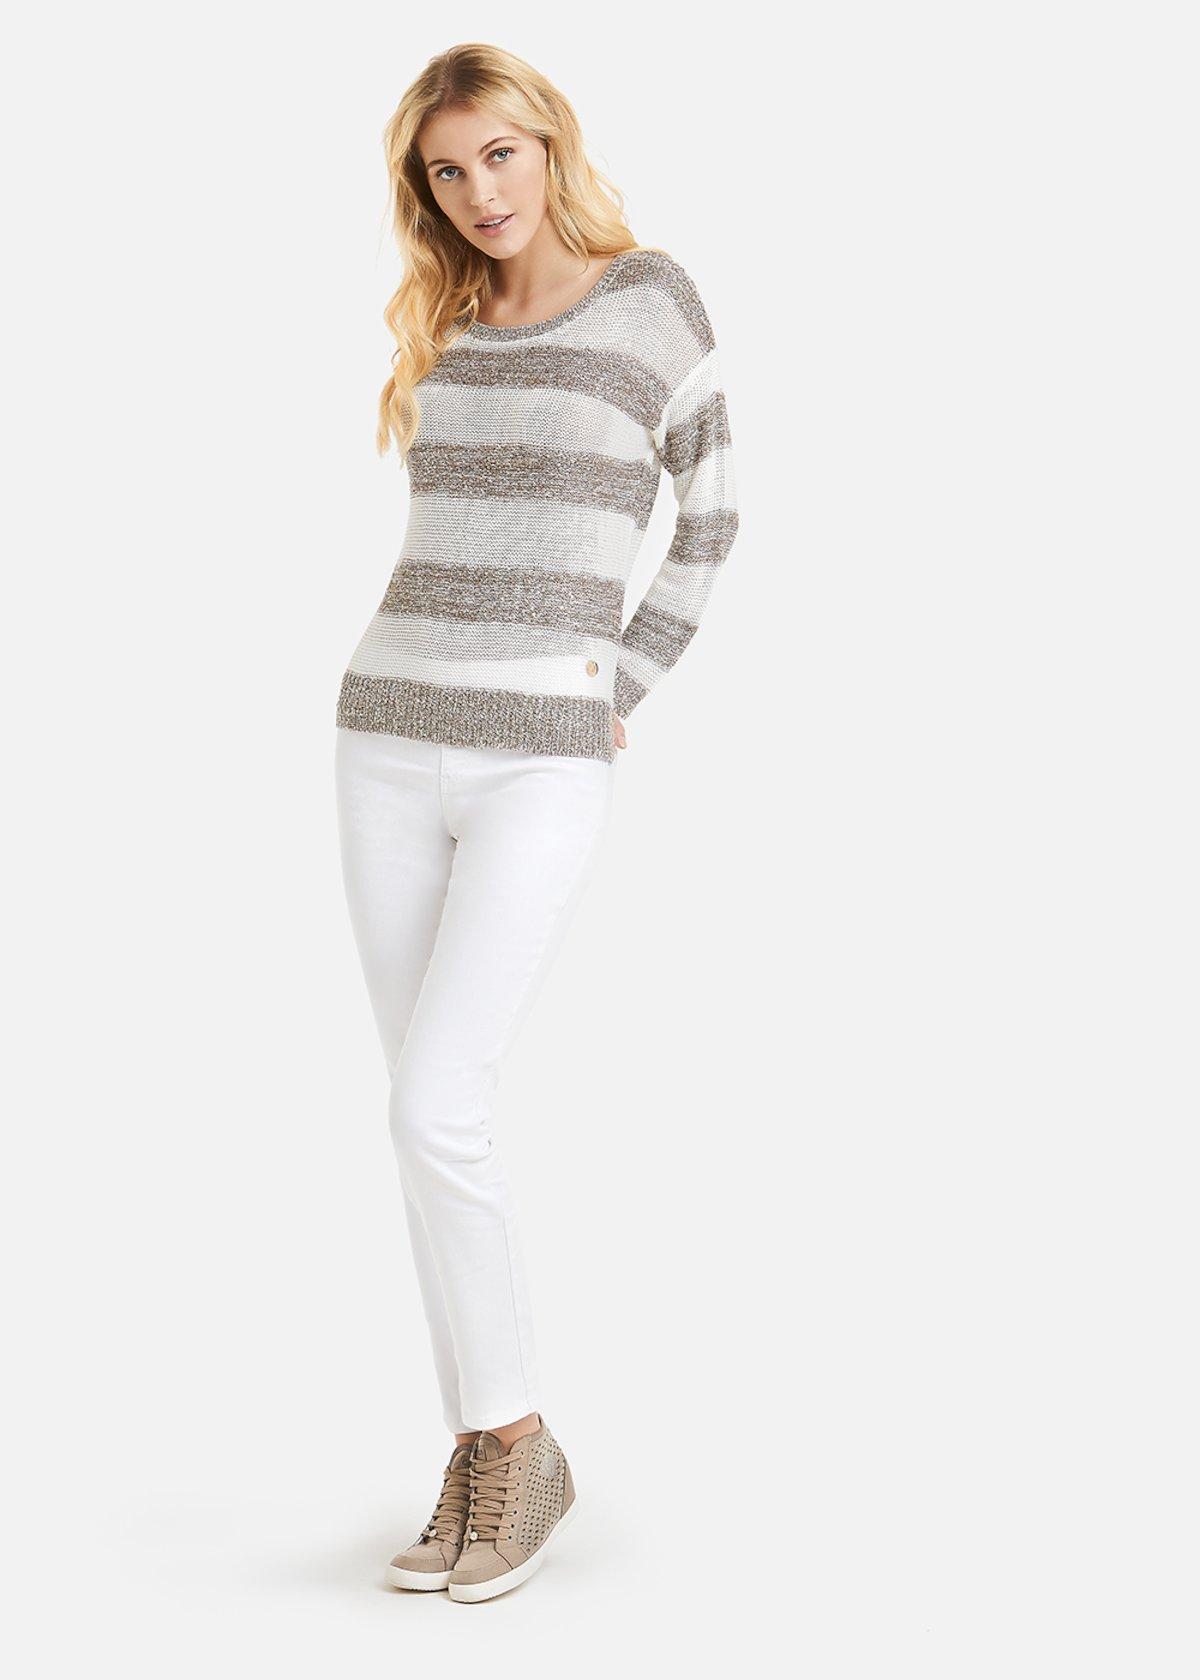 Melany sweater stripe fantasy with sequins - Desert / White Stripes